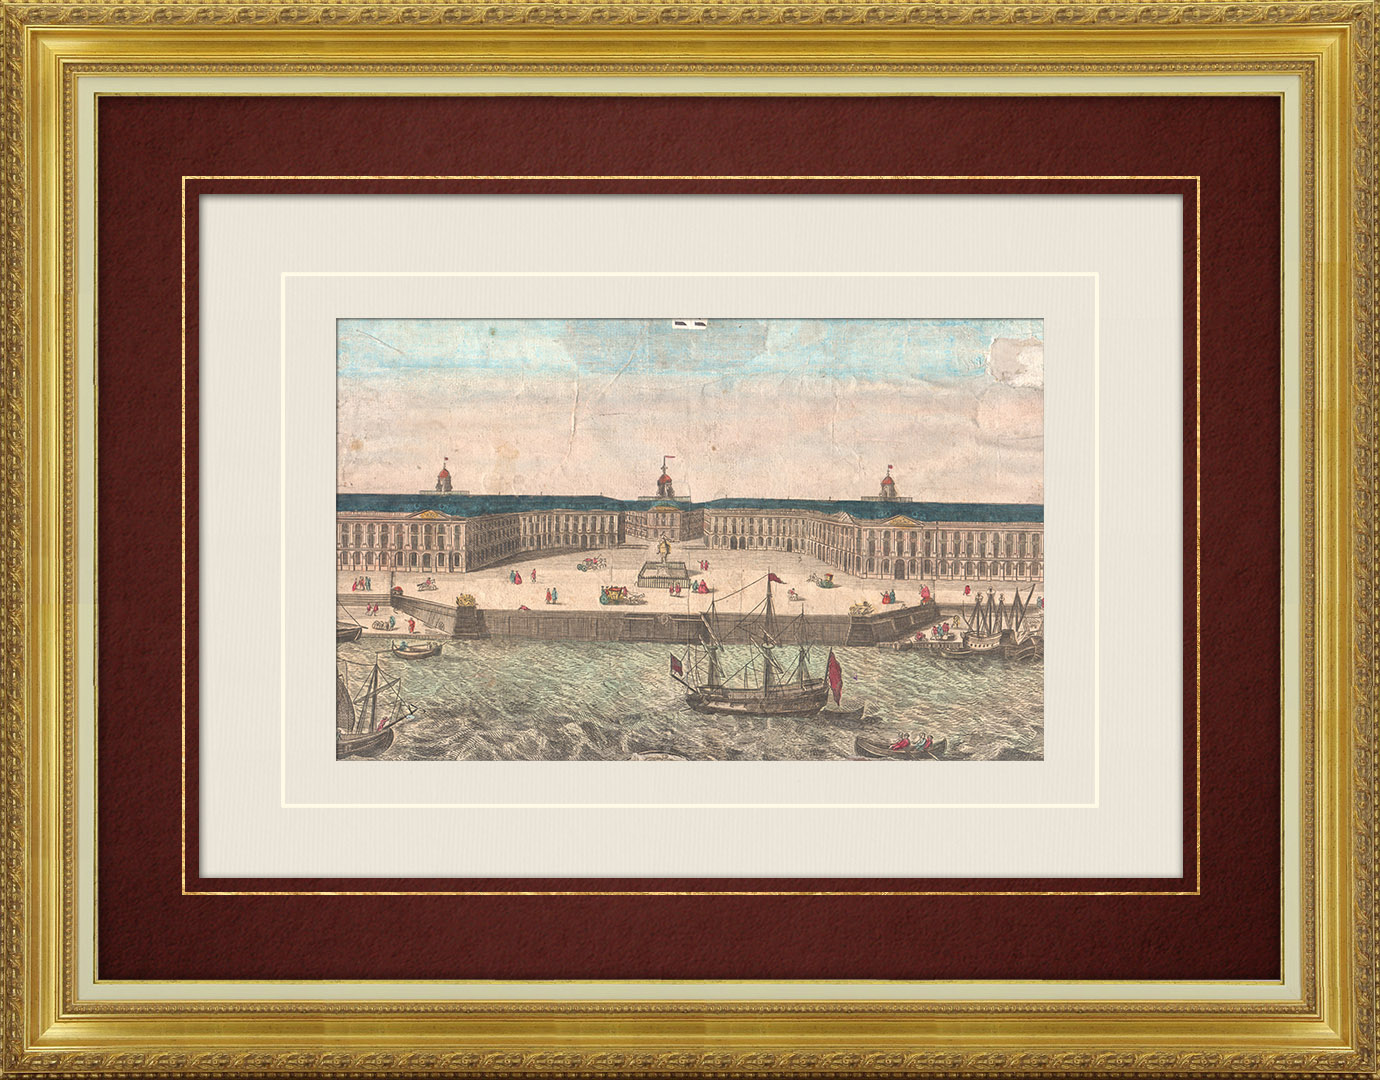 Veduta ottica del 18 secolo a colori d'epoca della Place Royale a Bordeaux (Francia)